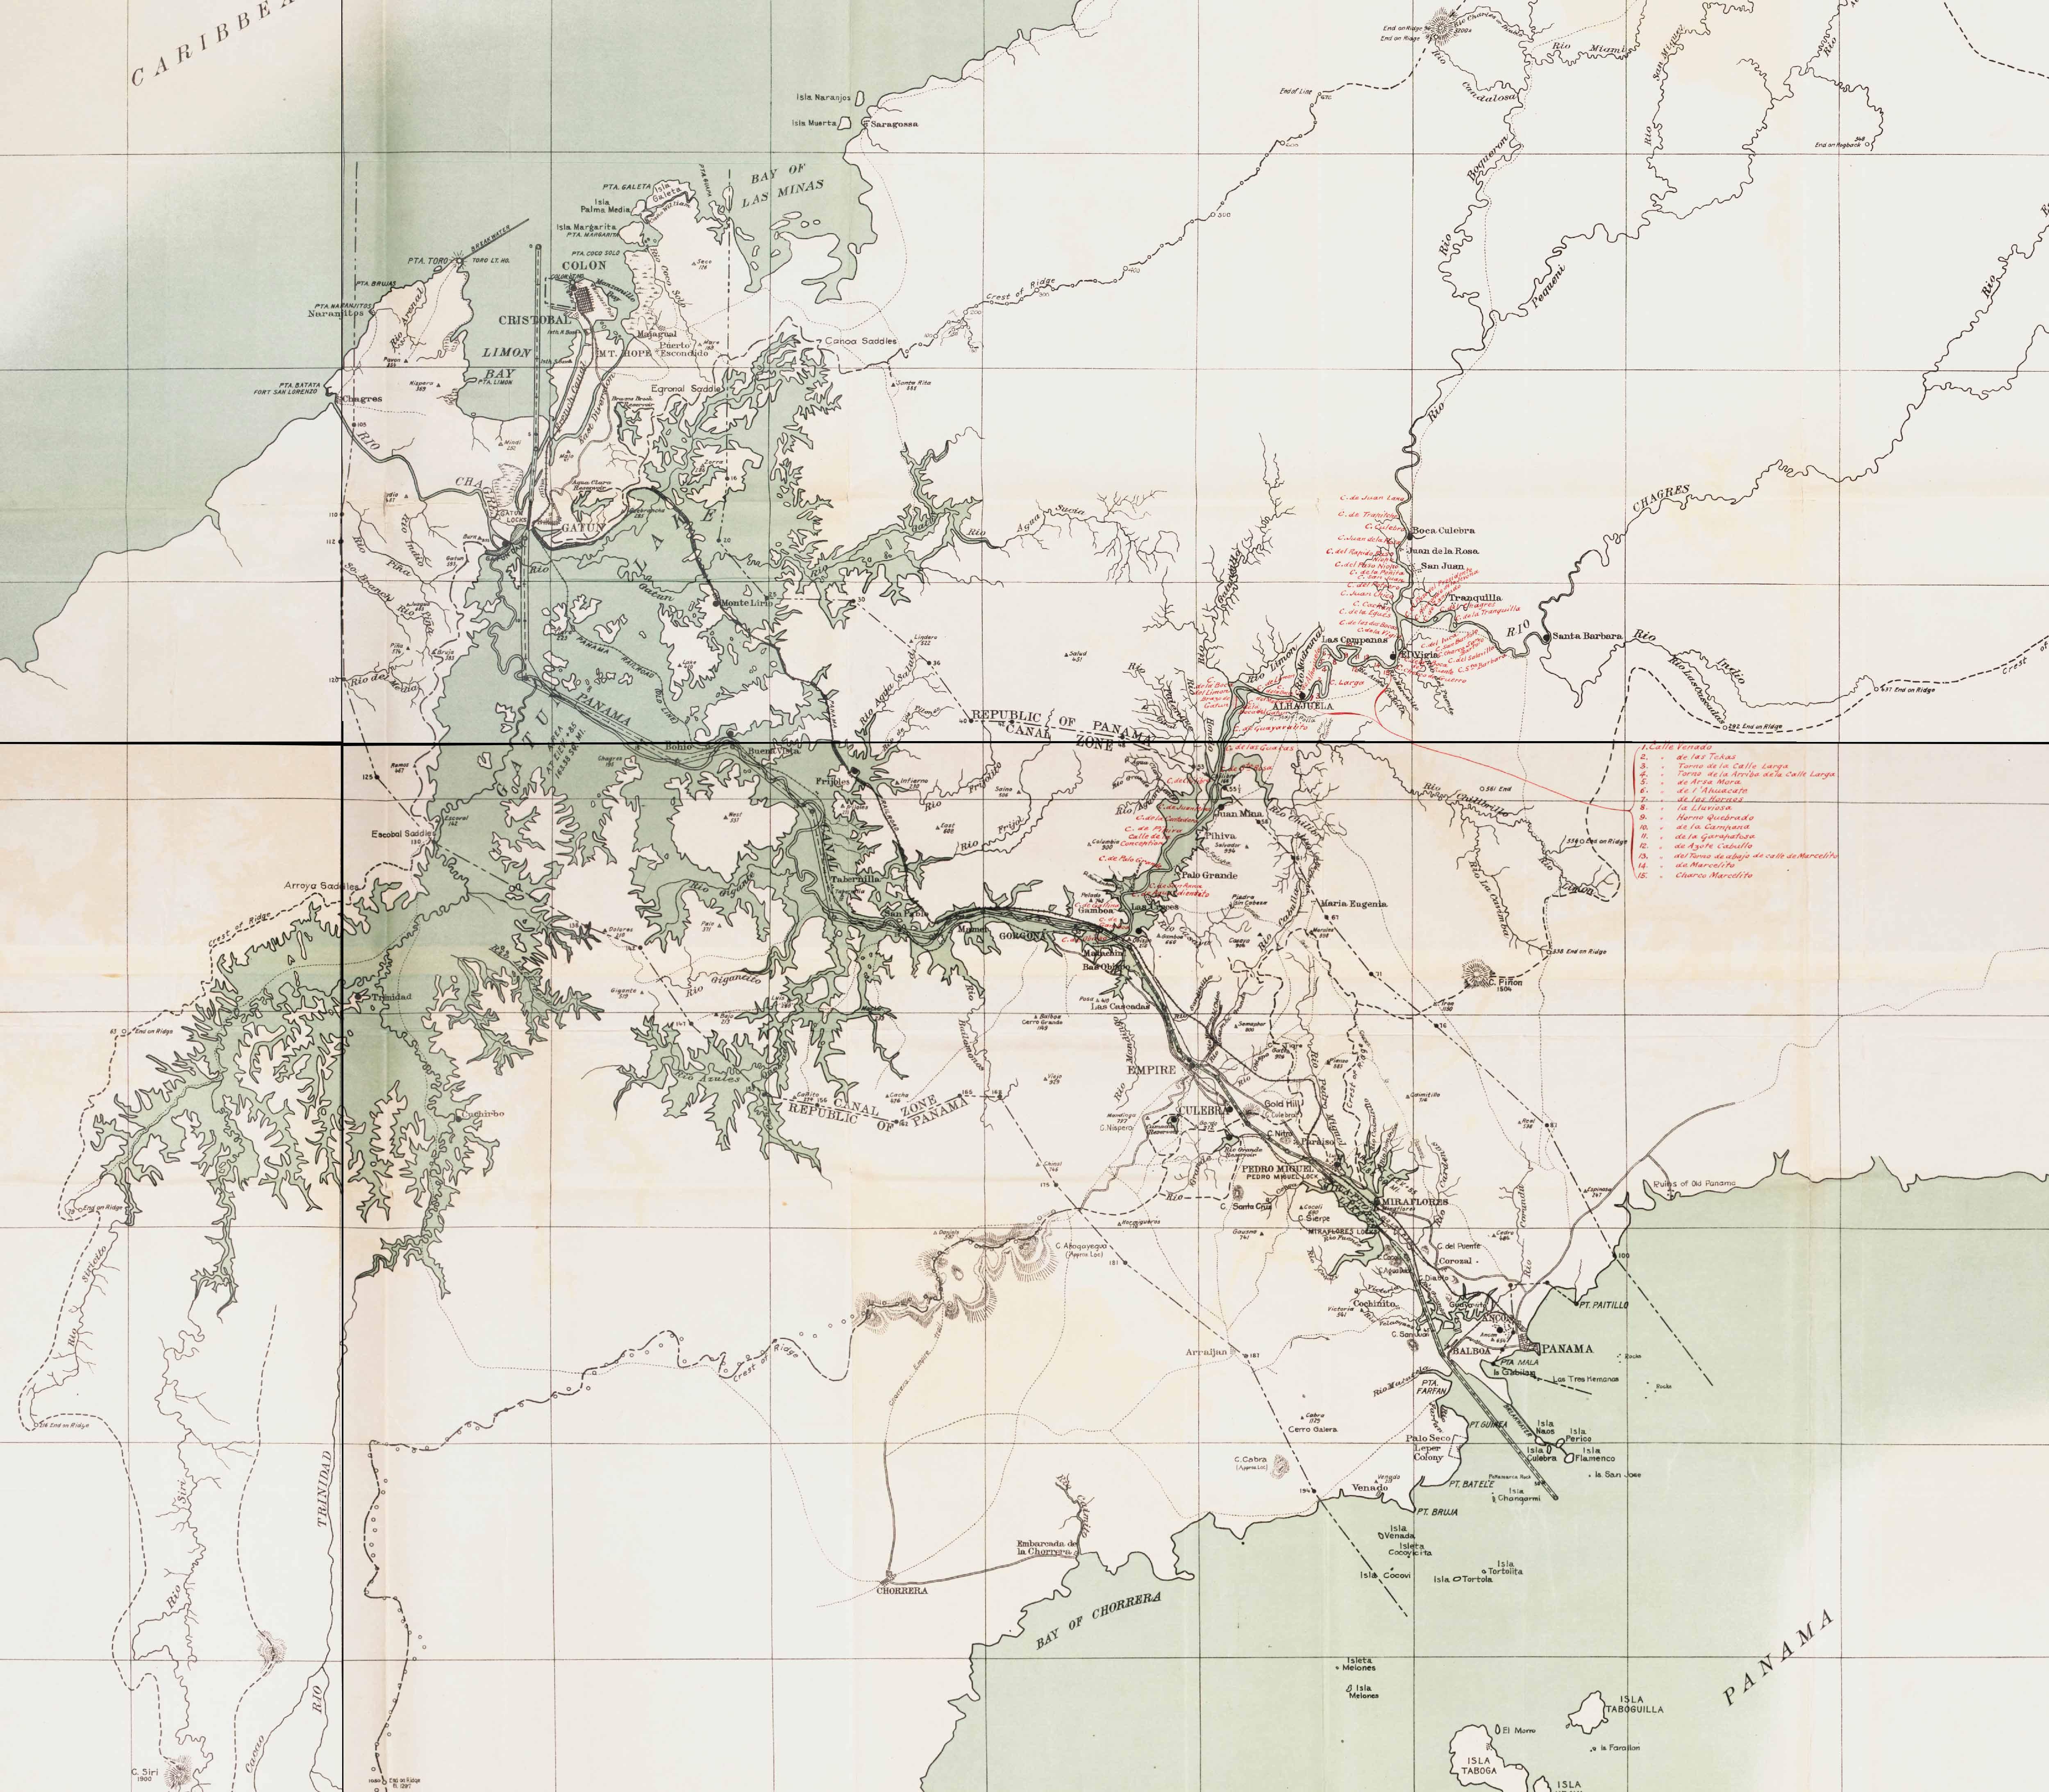 Explore the Map - Panama Exhibit Site